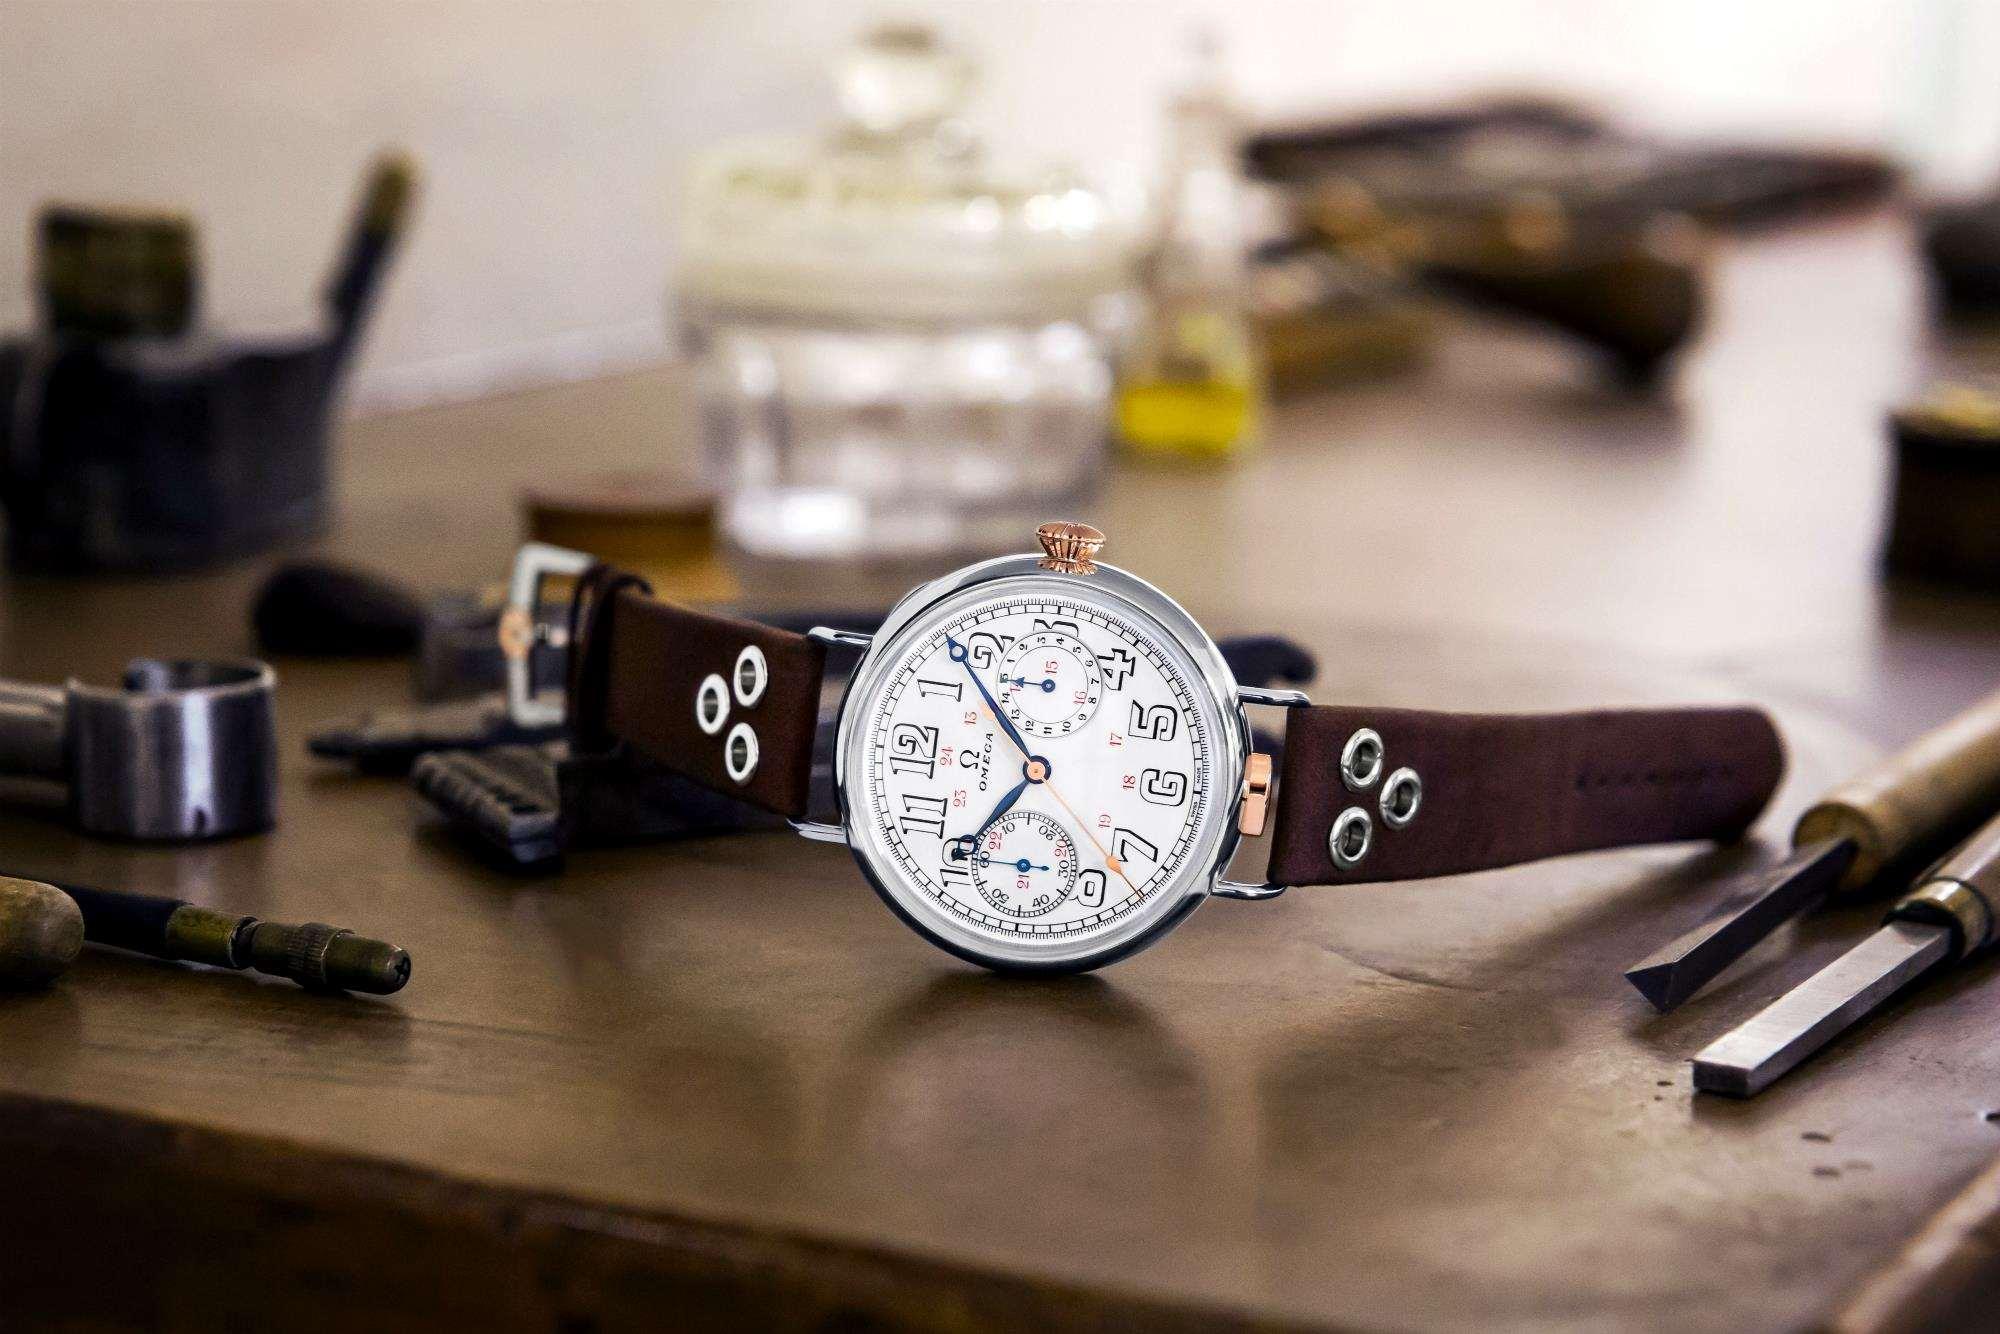 d36f72b850 Η Omega επανακυκλοφορεί ένα στρατιωτικό ρολόι ηλικίας 105 ετών